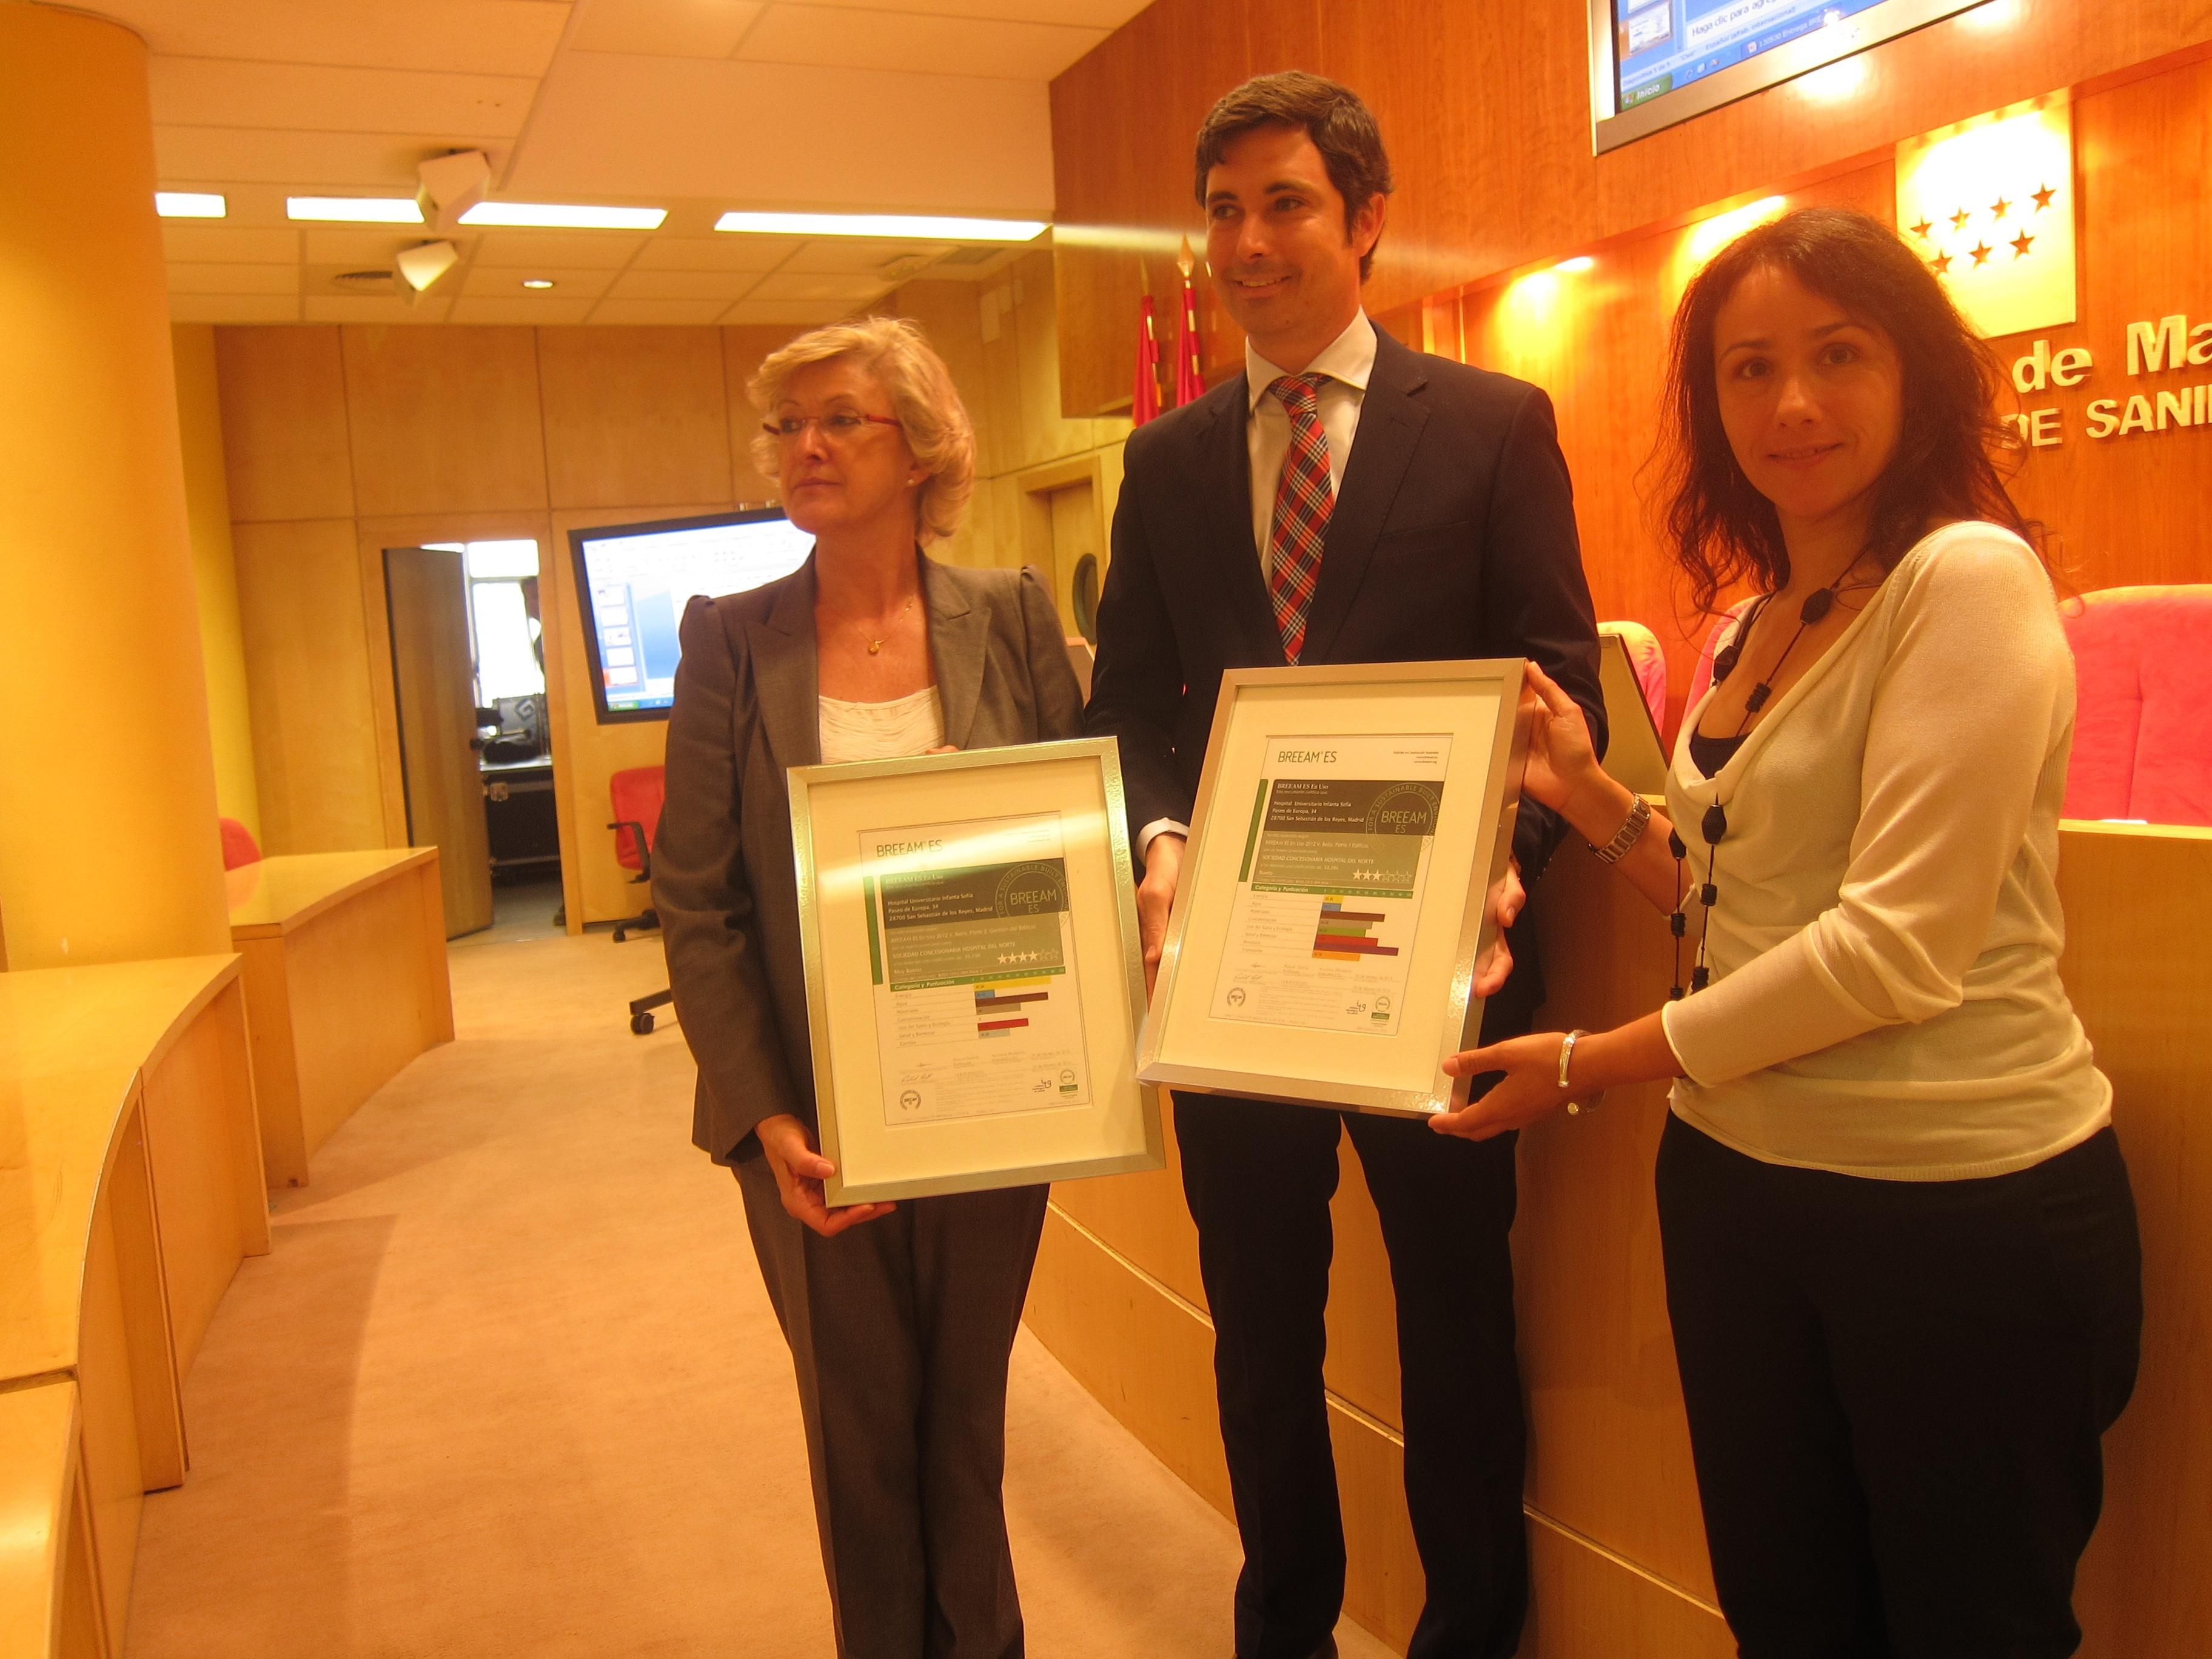 El Hospital Infanta Sofía deja de emitir 2.259 toneladas de dióxido de carbono gracias a medidas de ahorro energético